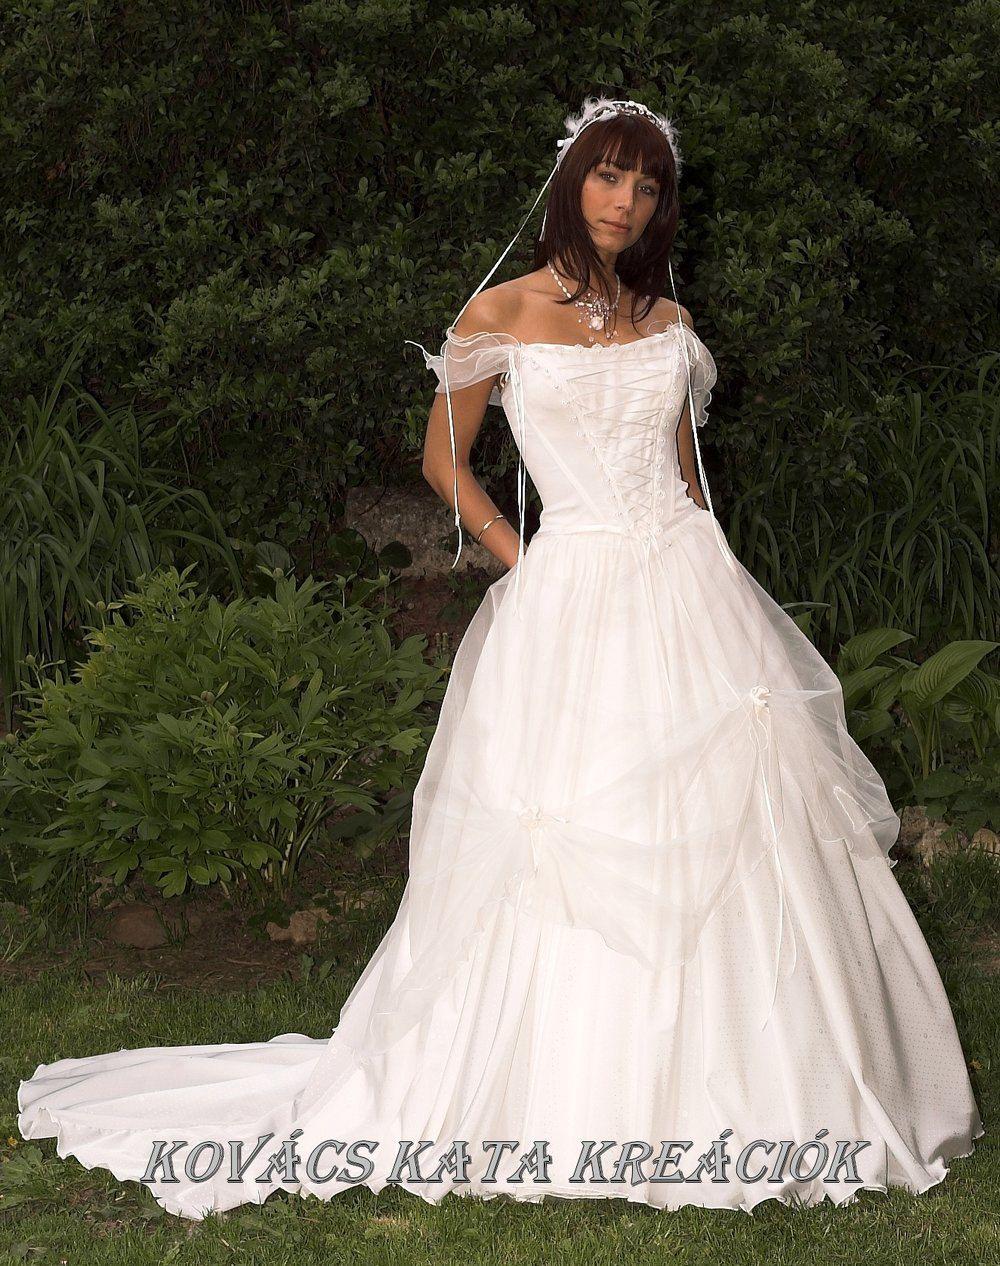 Renaissance inspired wedding dress